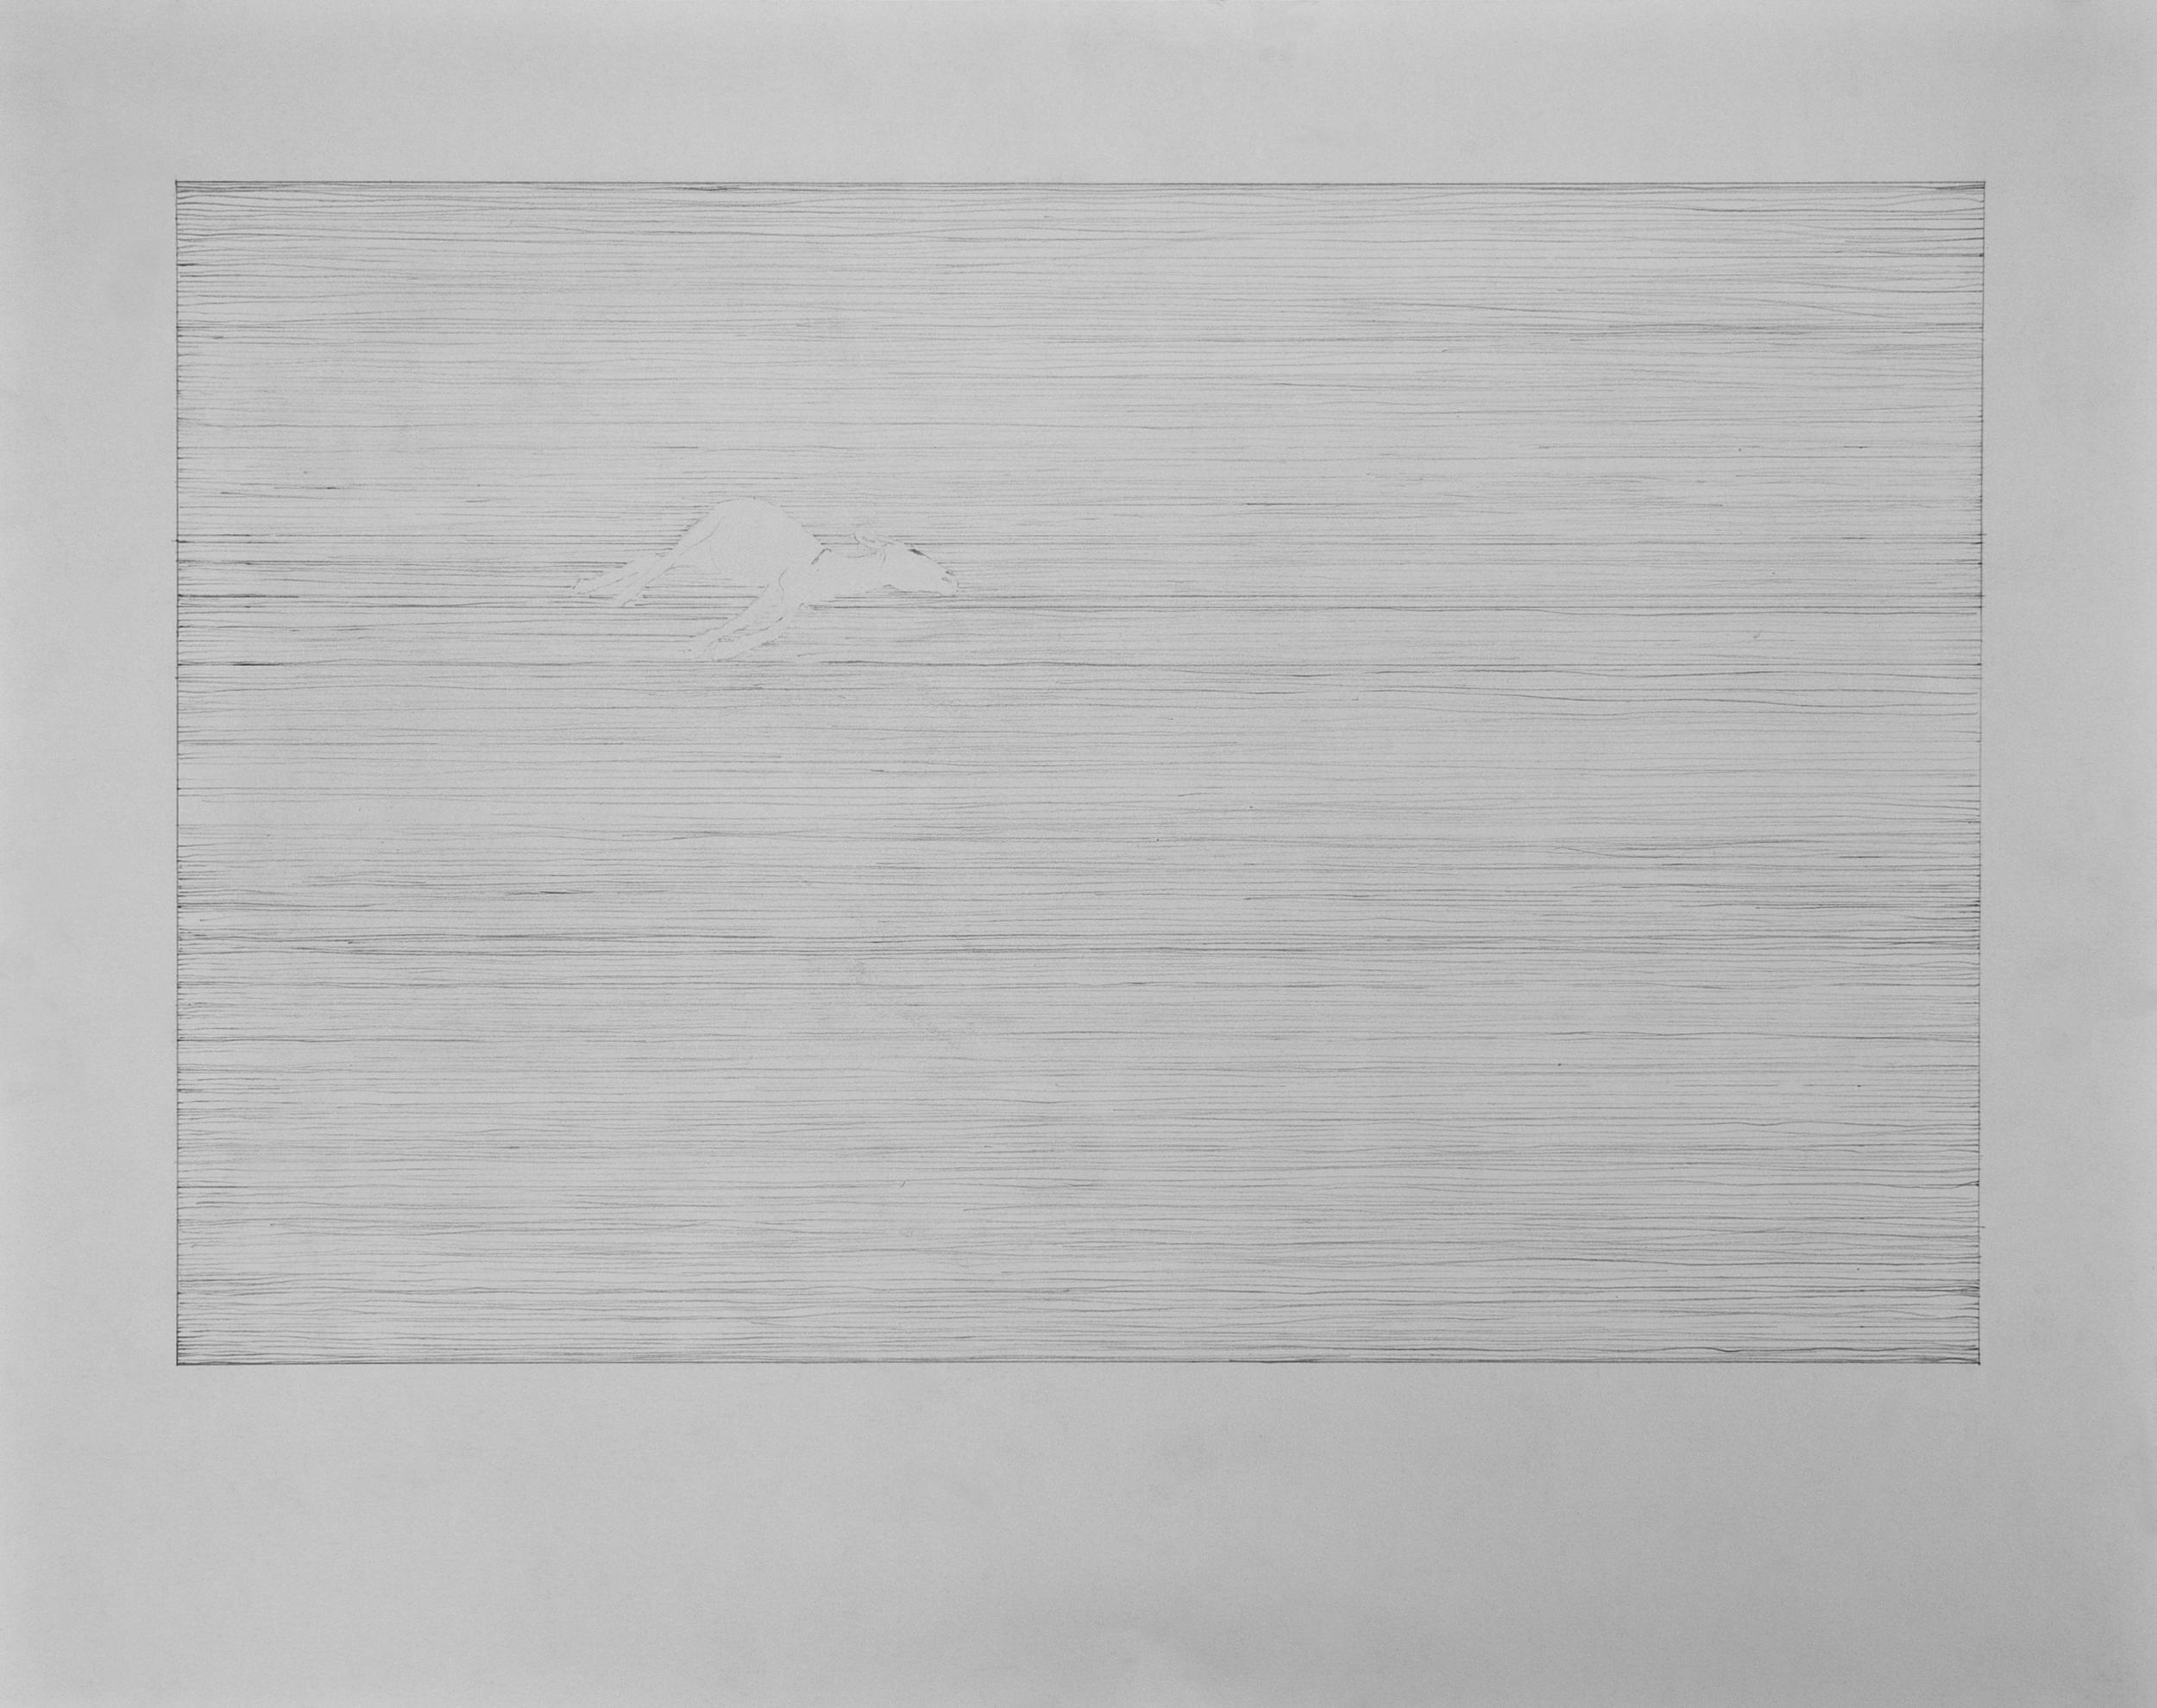 Graphite on paper  2011,61x48cm